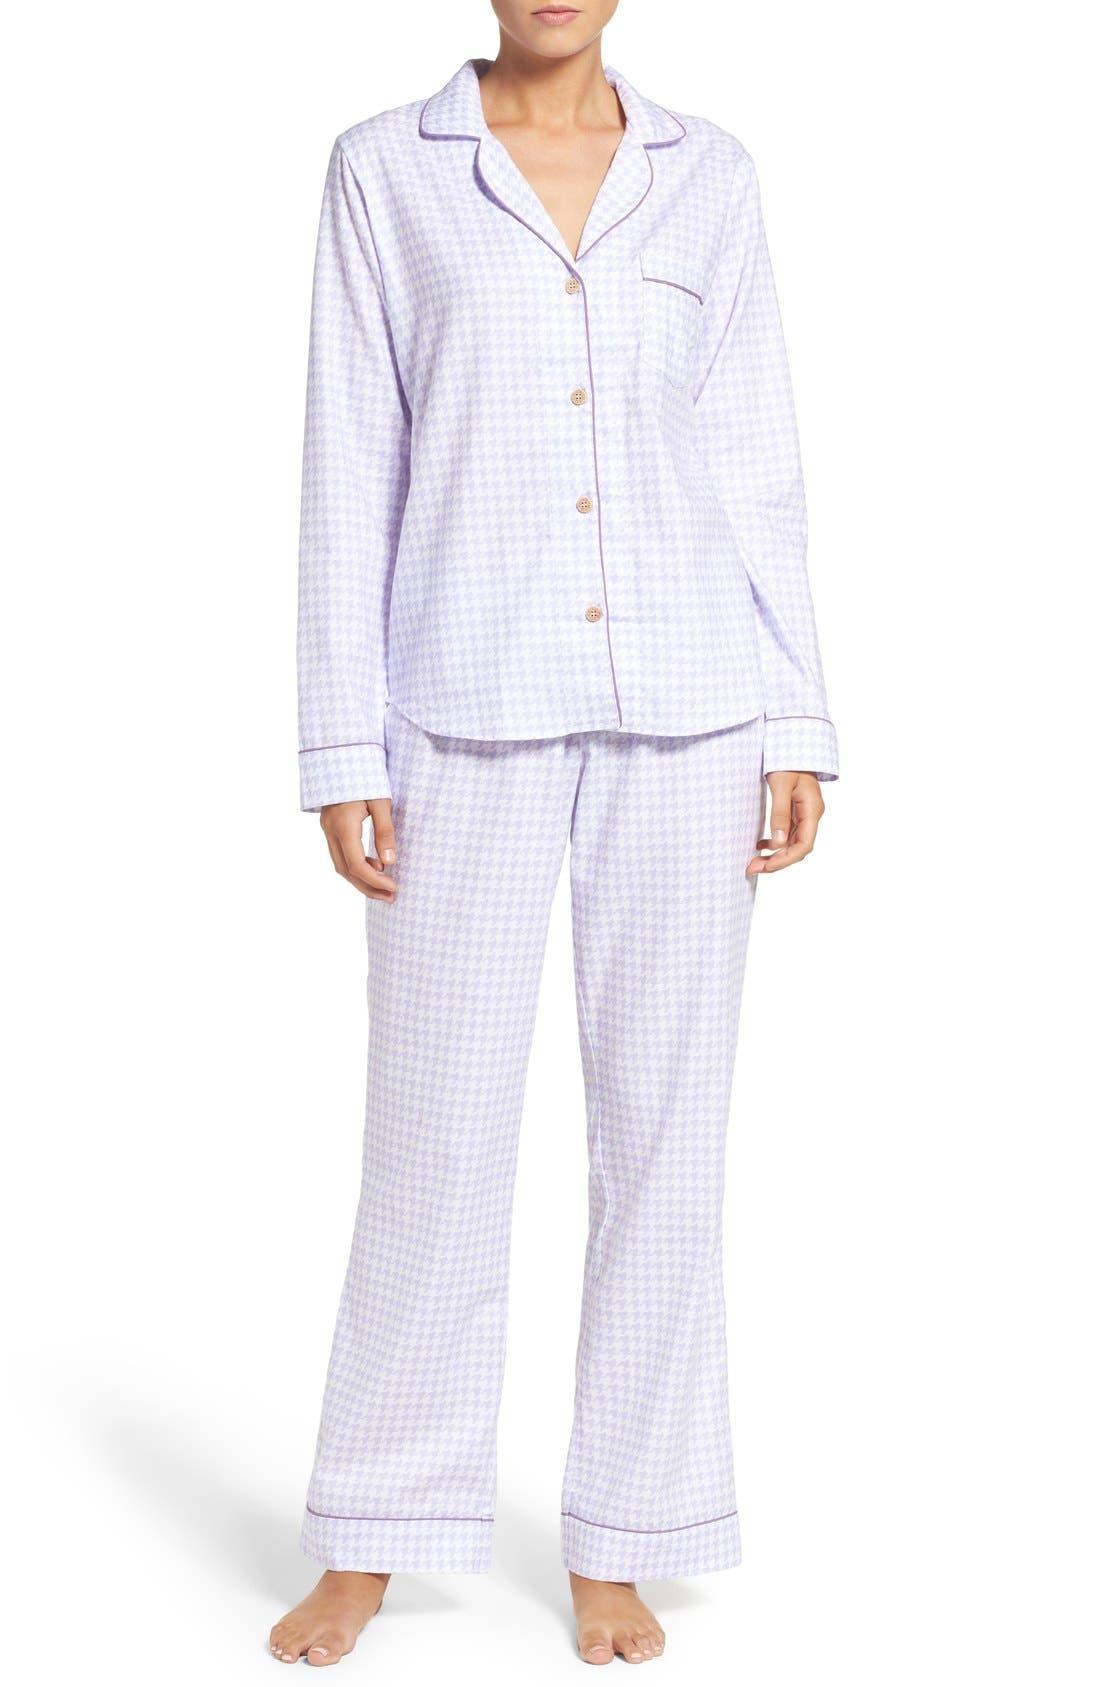 Alternate Image 1 Selected - UGG® 'Raven' Houndstooth Pajamas